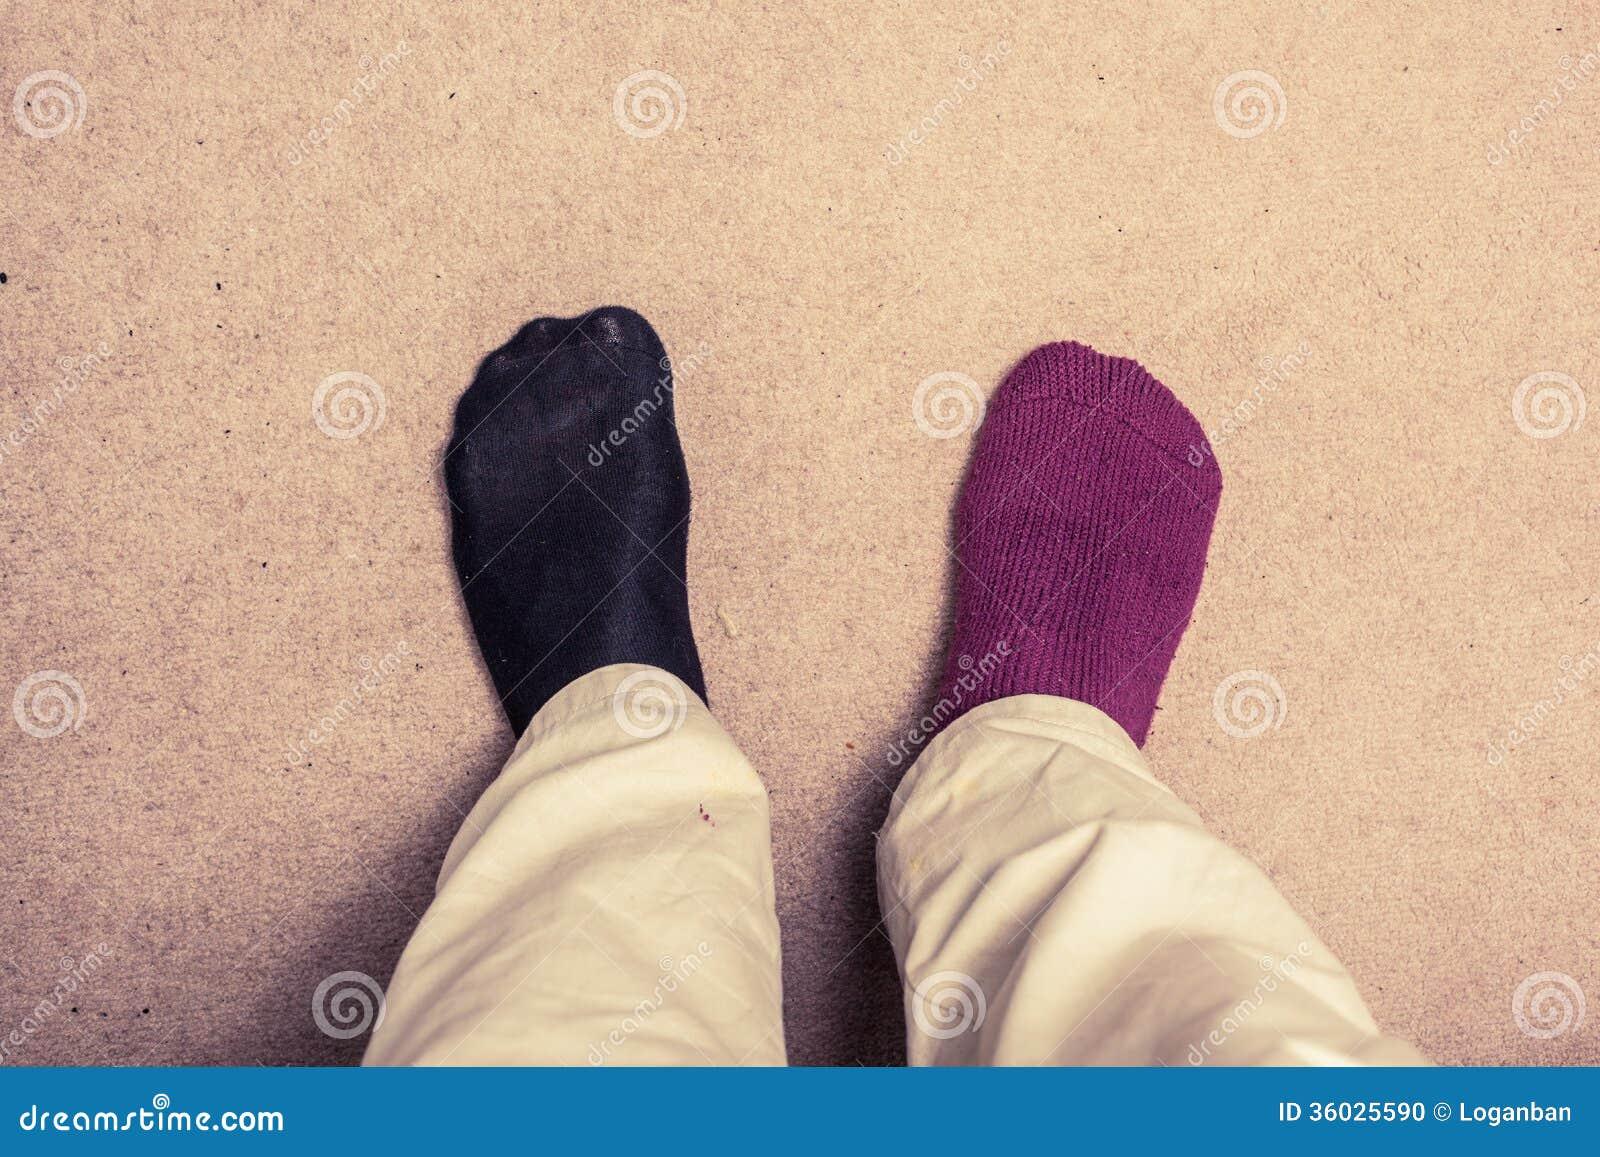 Feet With Odd Socks On Carpet Stock Photo Image 36025590